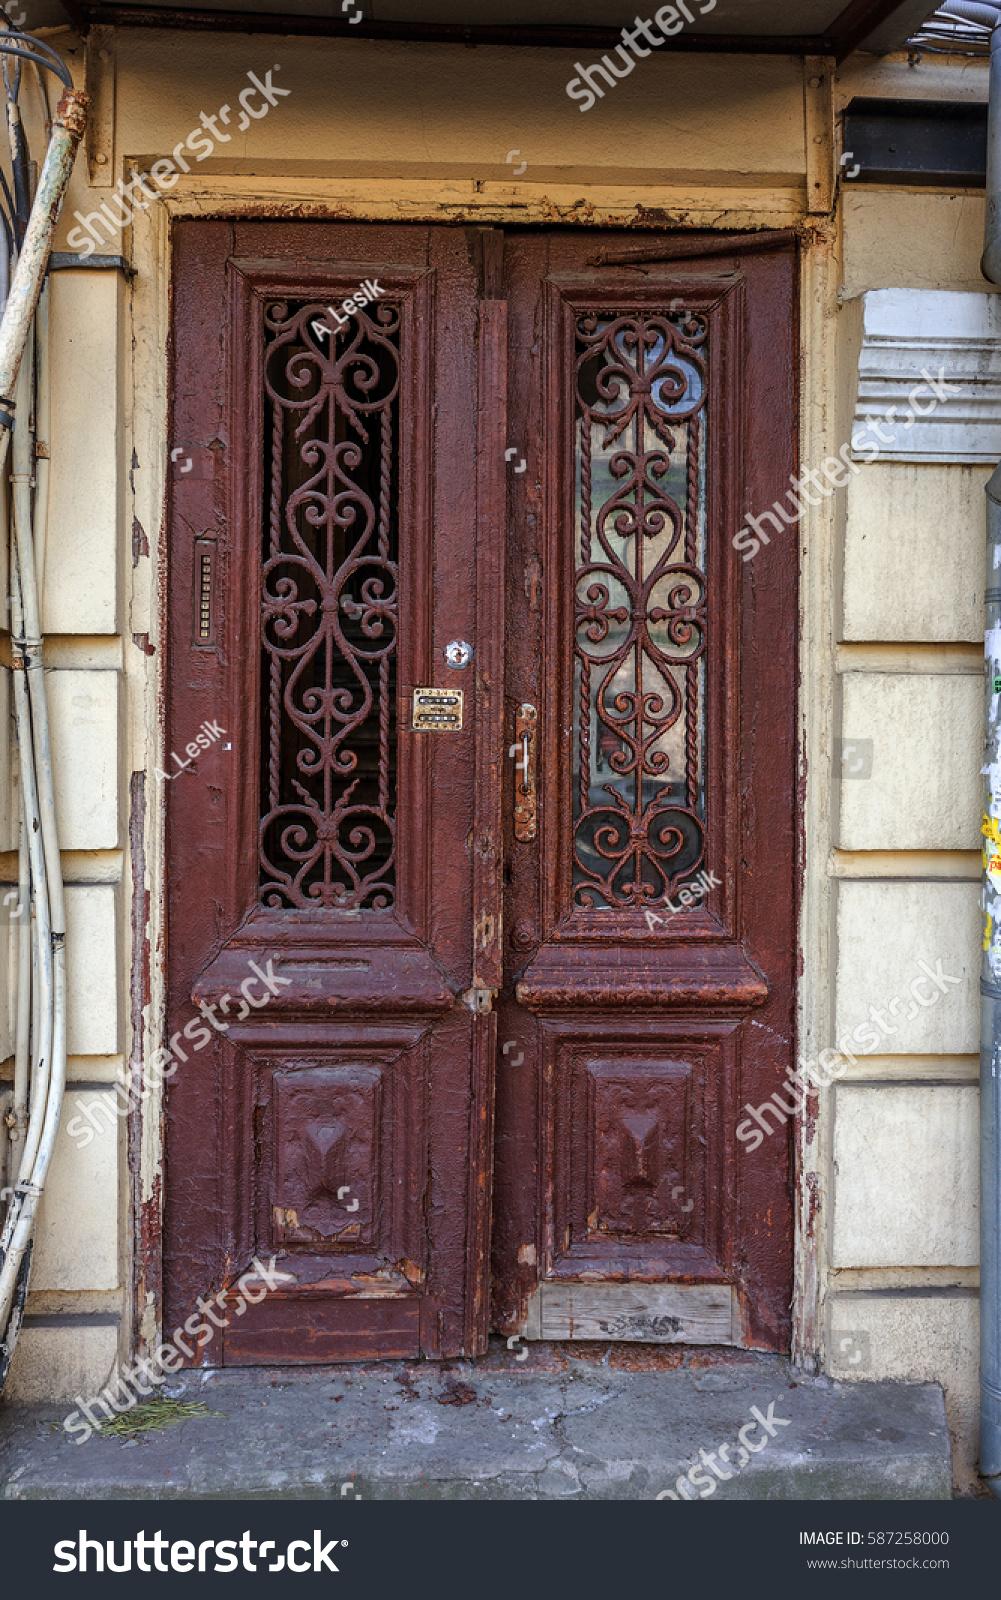 Old Retro Vintage Exterior Door Old Stock Photo Edit Now 587258000